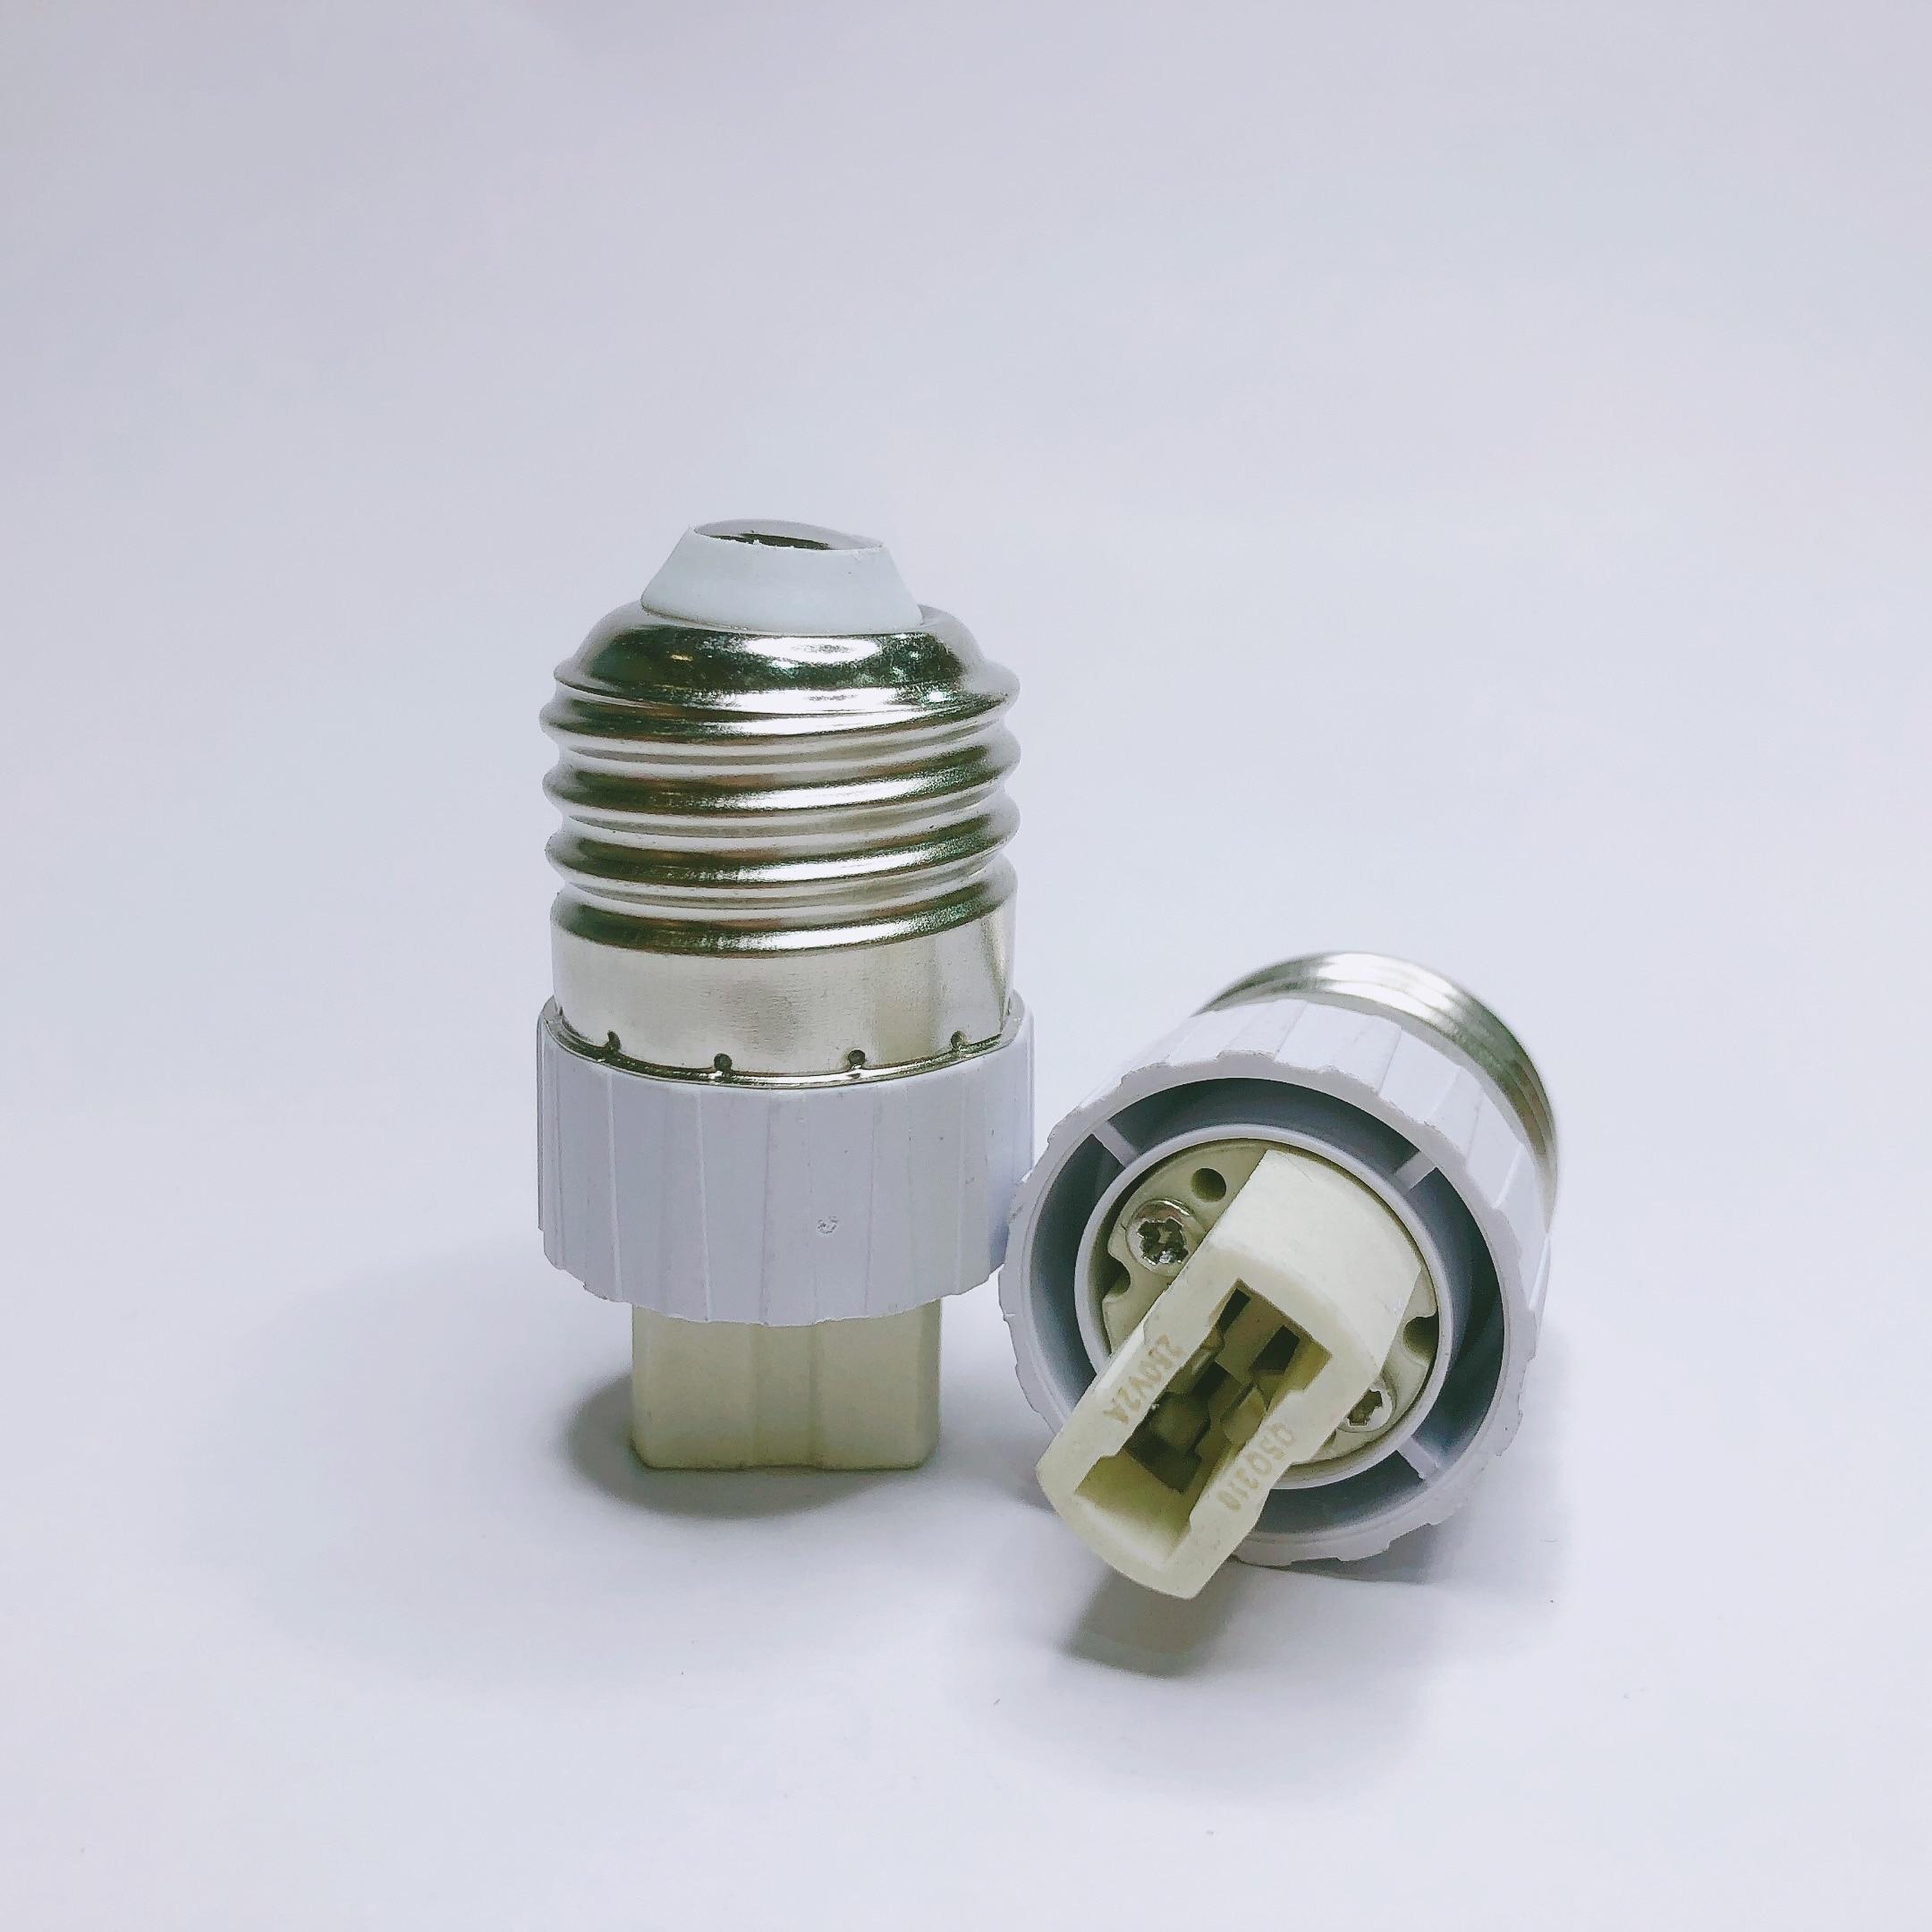 1x Fireproof Material E27 To G9 Lamp Holder Converter Socket Conversion Light Bulb Base Type Adapter